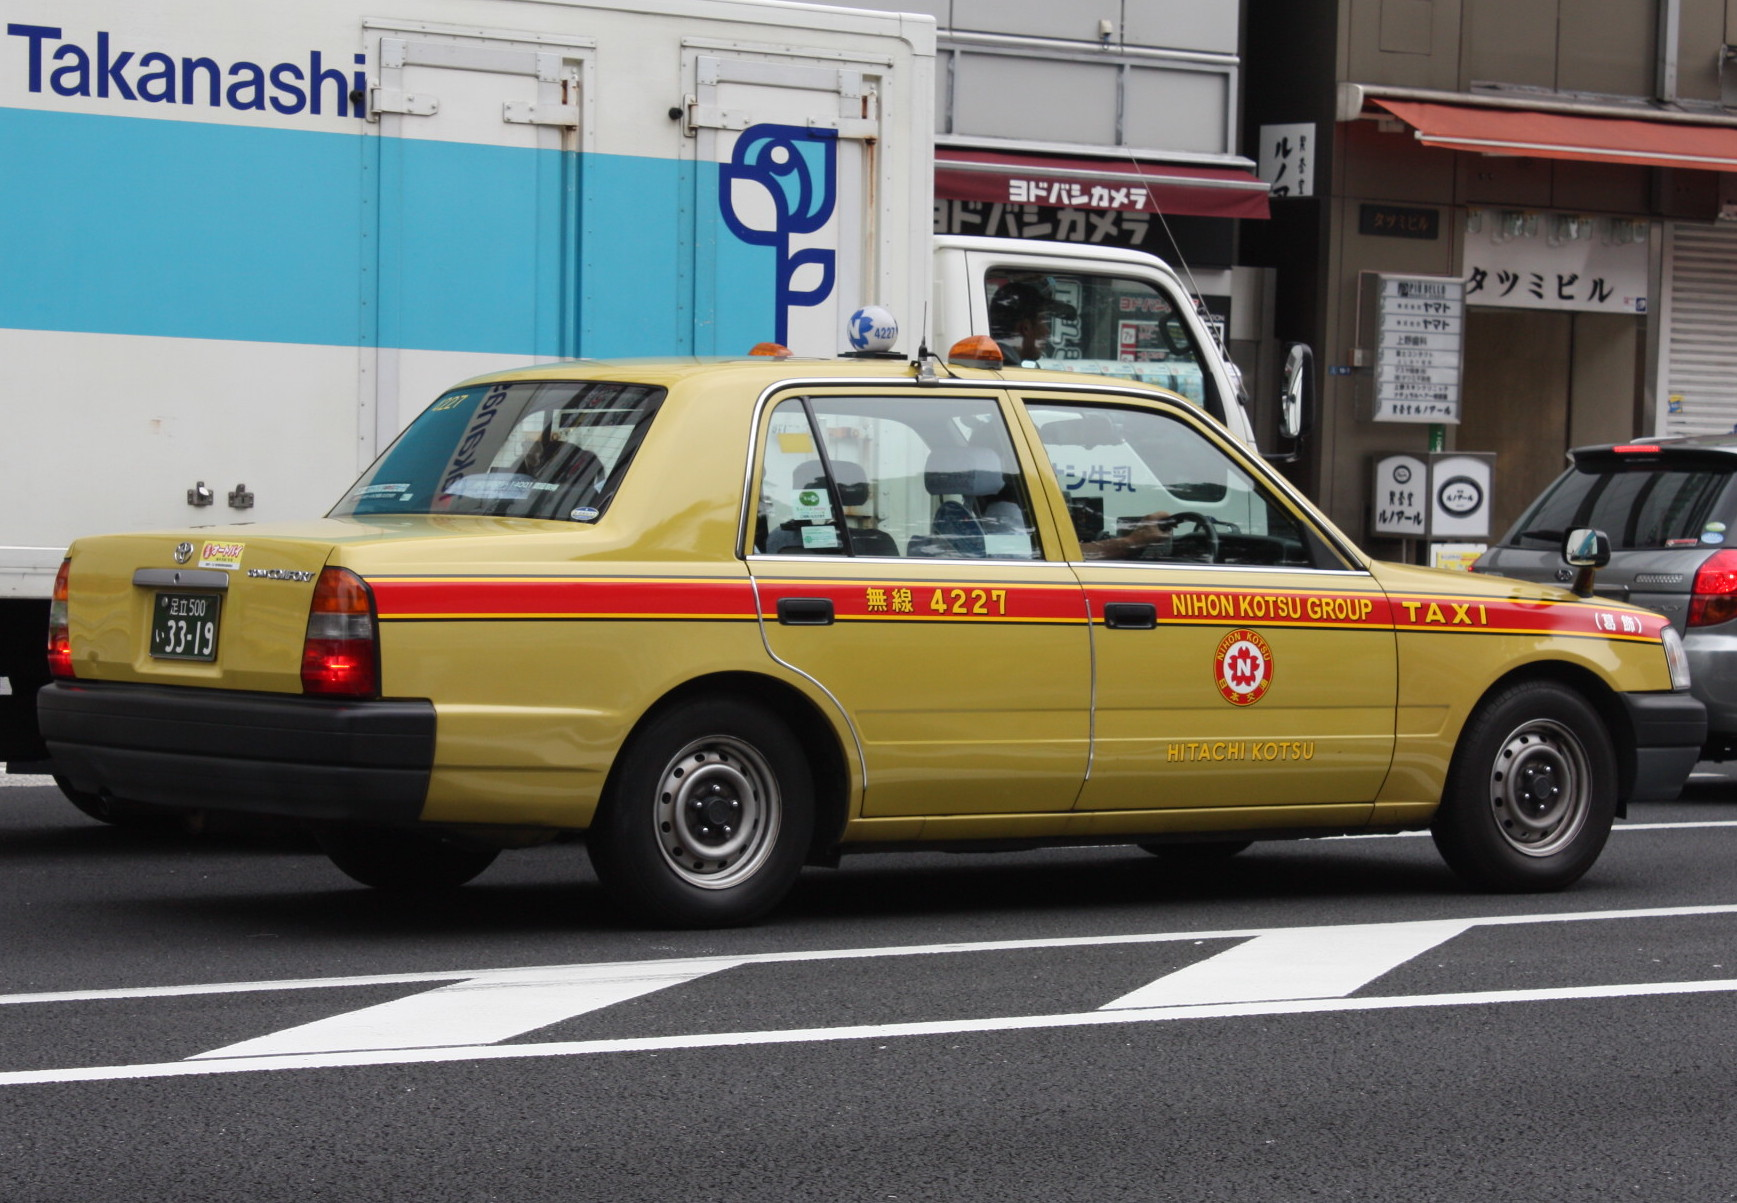 Tokyo taxicab photo